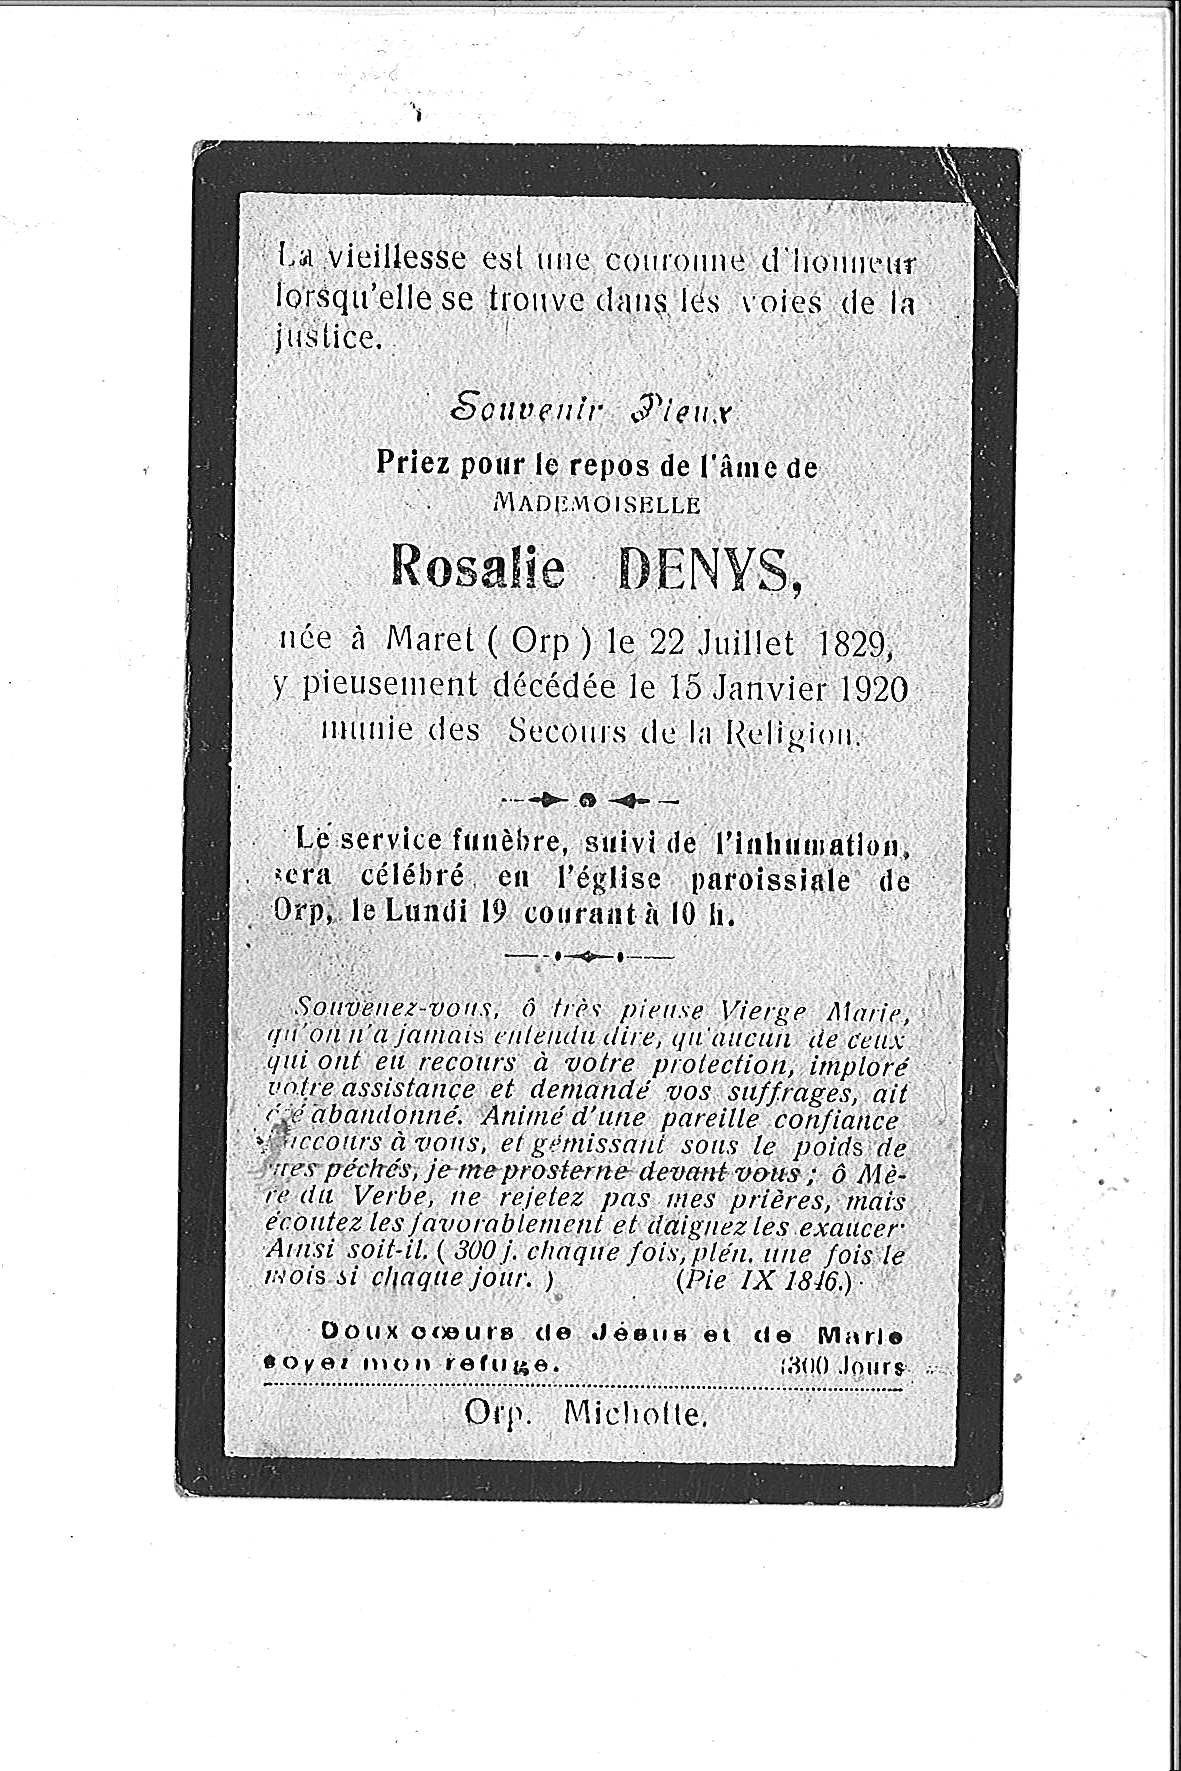 Rosalie(1920)20150415130638_00037.jpg